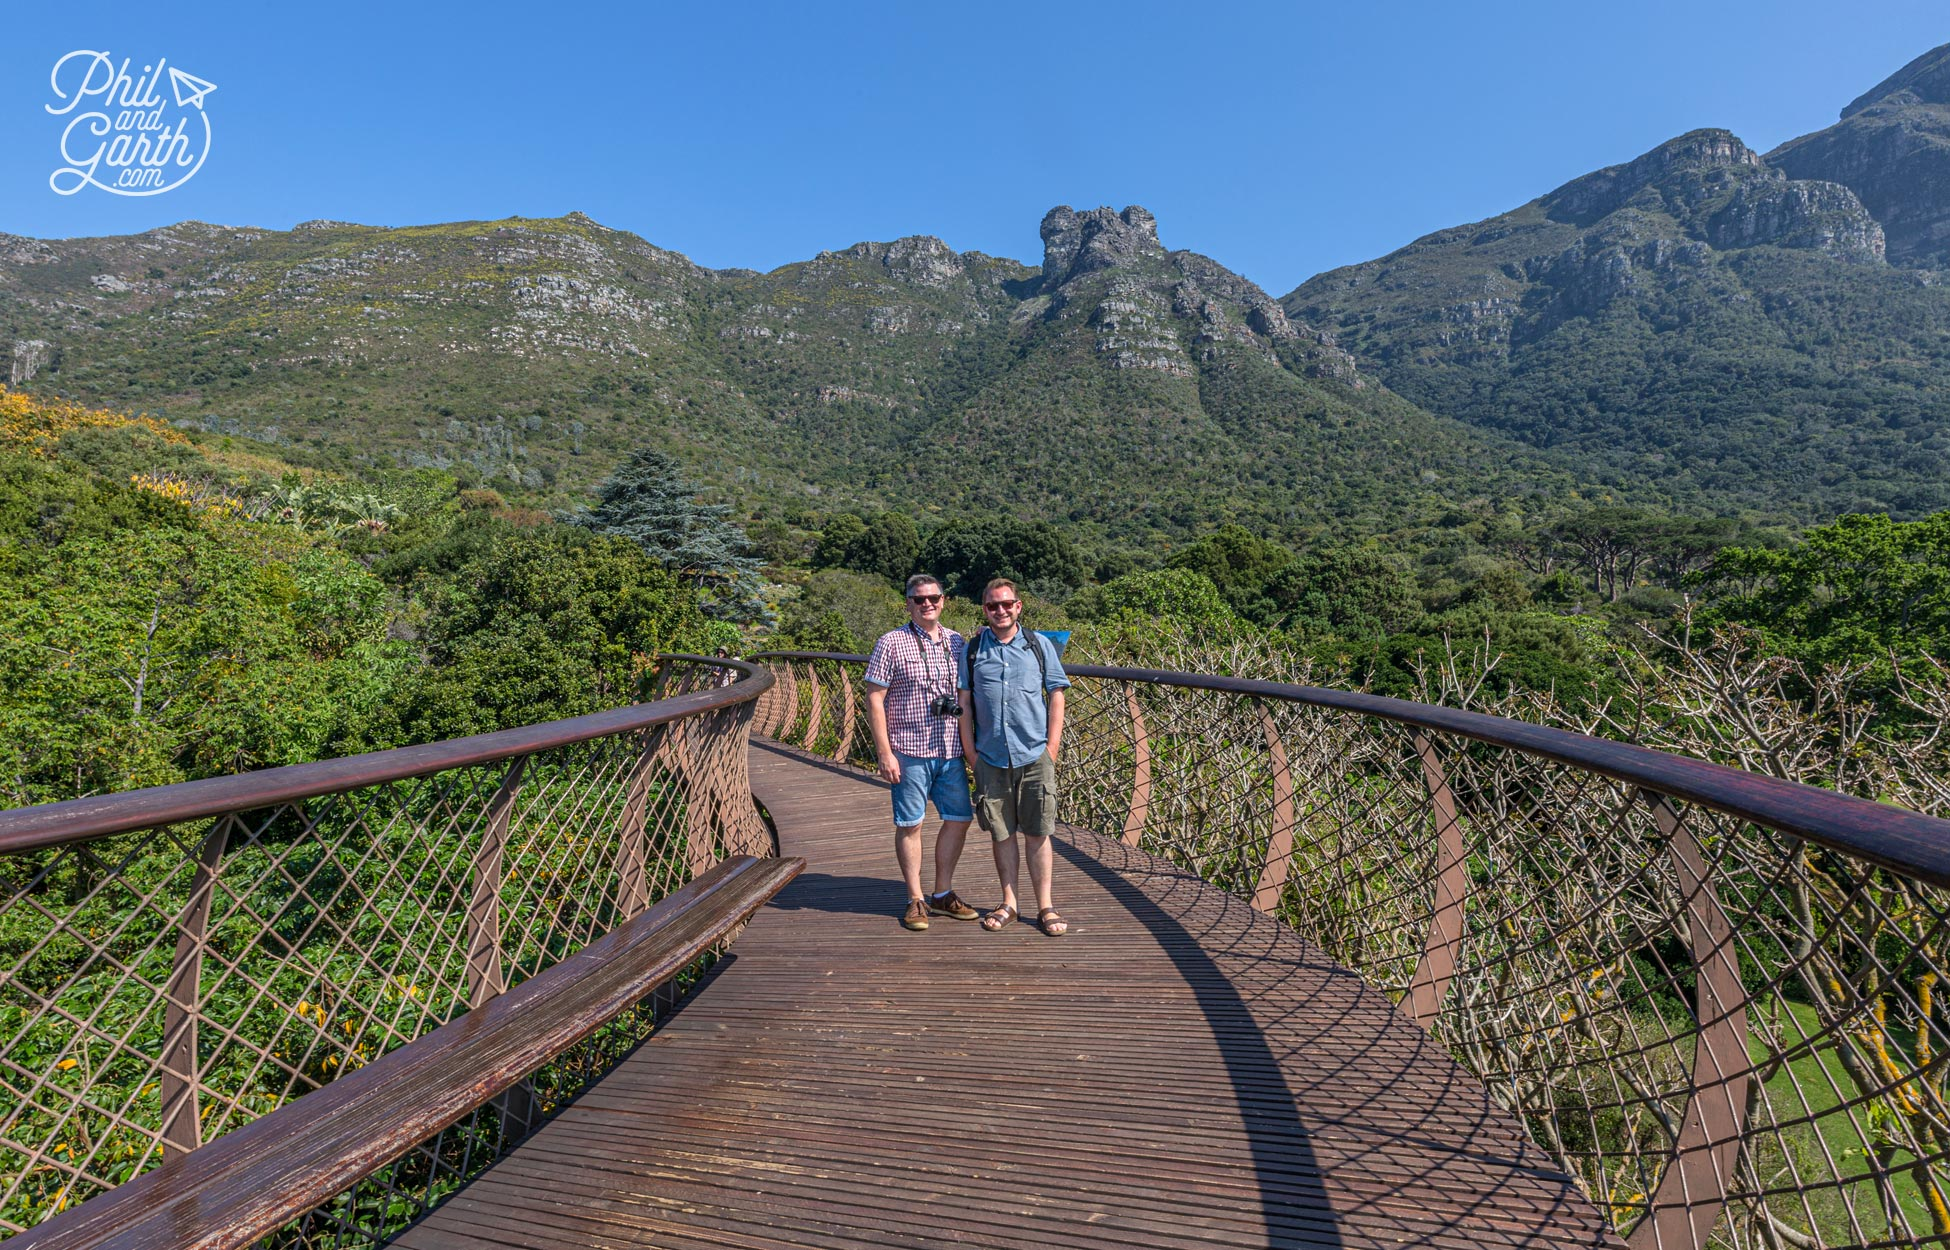 Phil and Garth Kirstenbosch's Tree Canopy Walkway